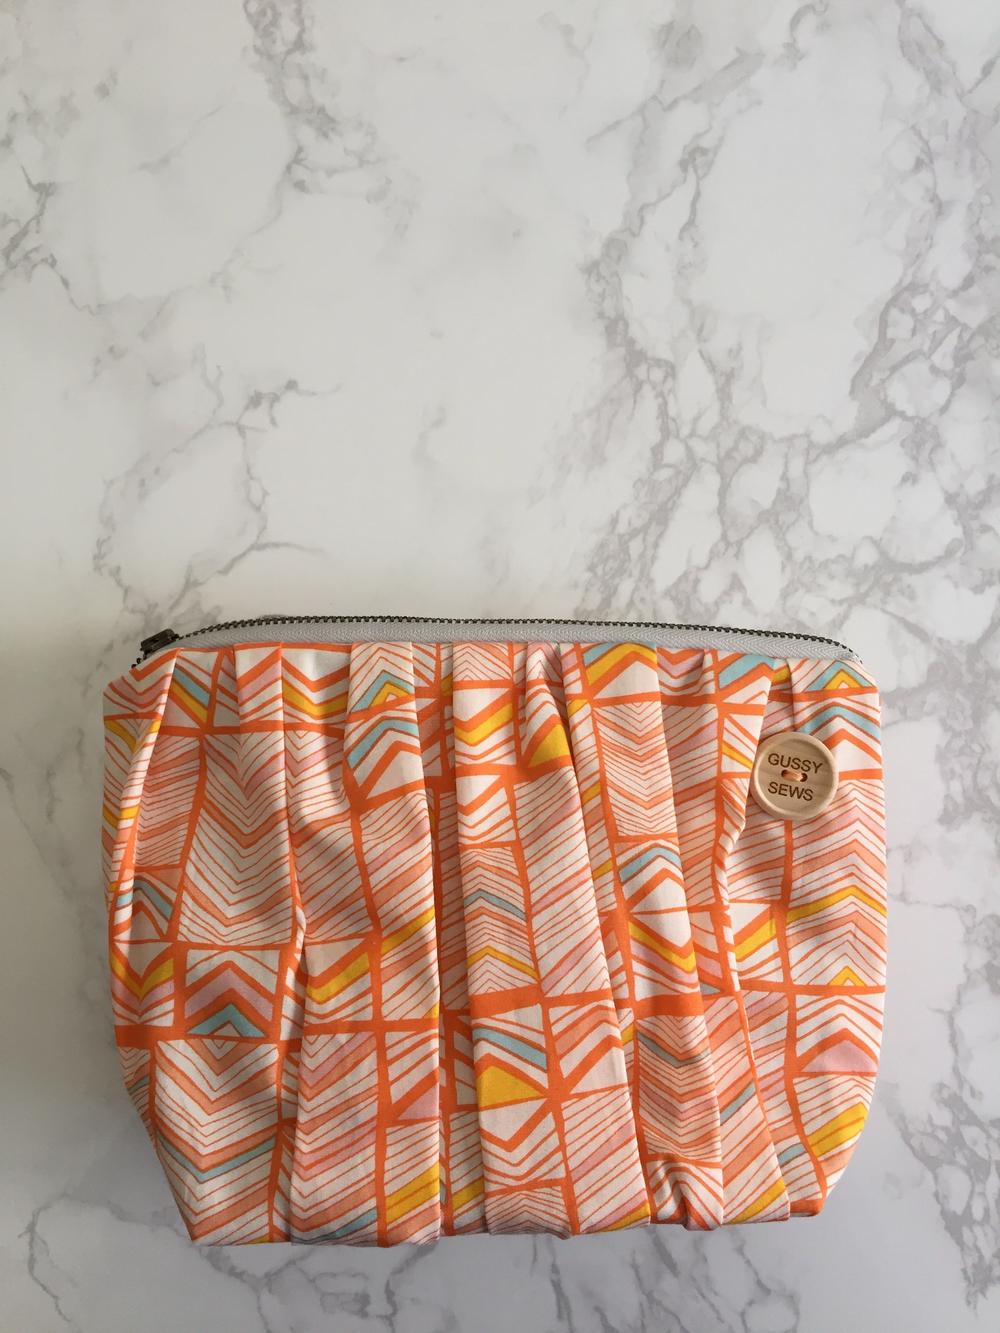 Image of Peachy Peach large zip